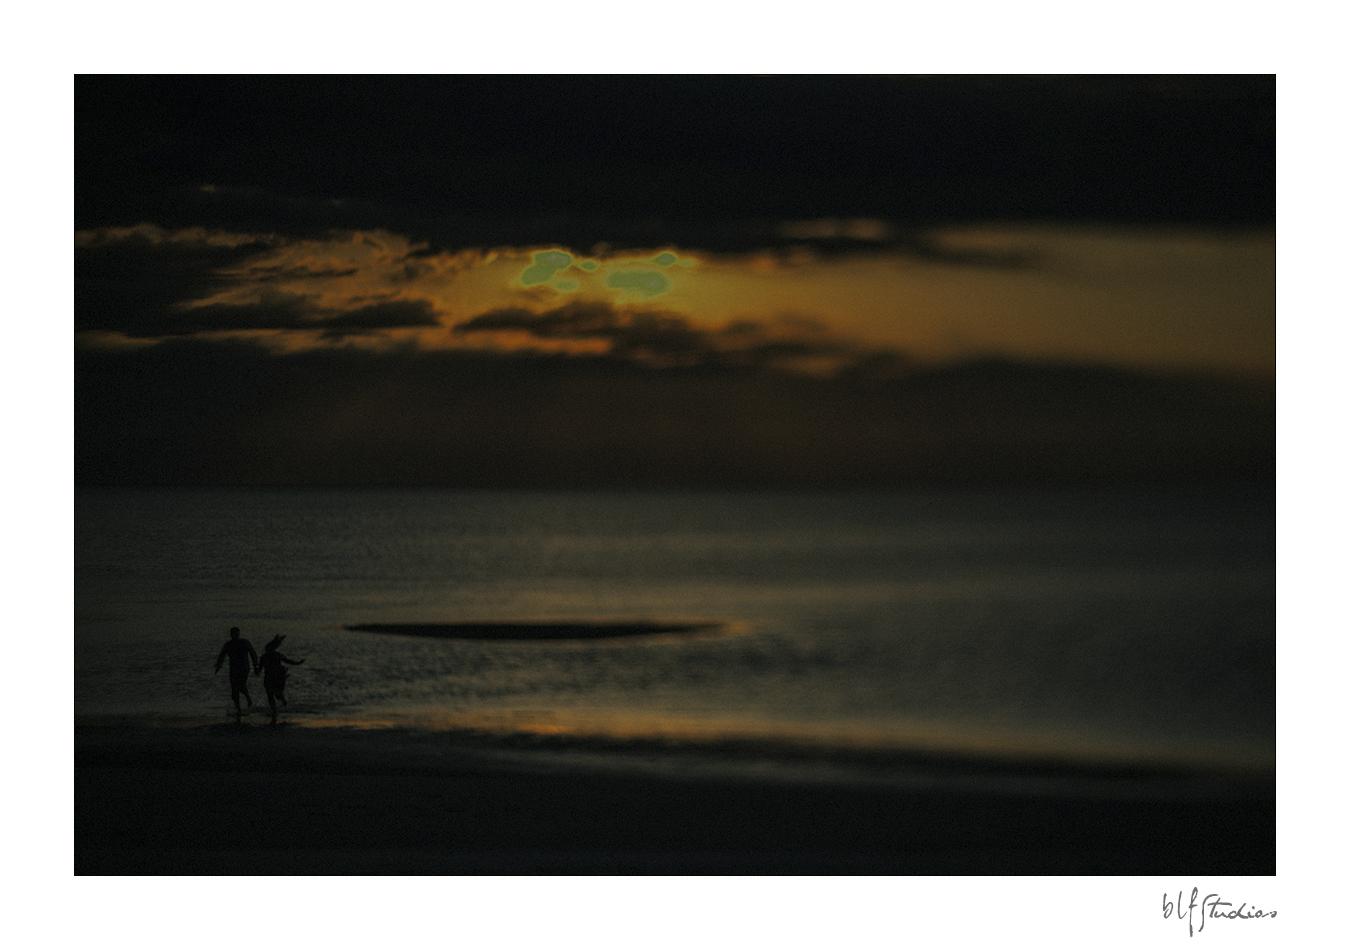 0028-blfstudios-grandbeach-manitoba-engagementphotos-kelijustin.jpg